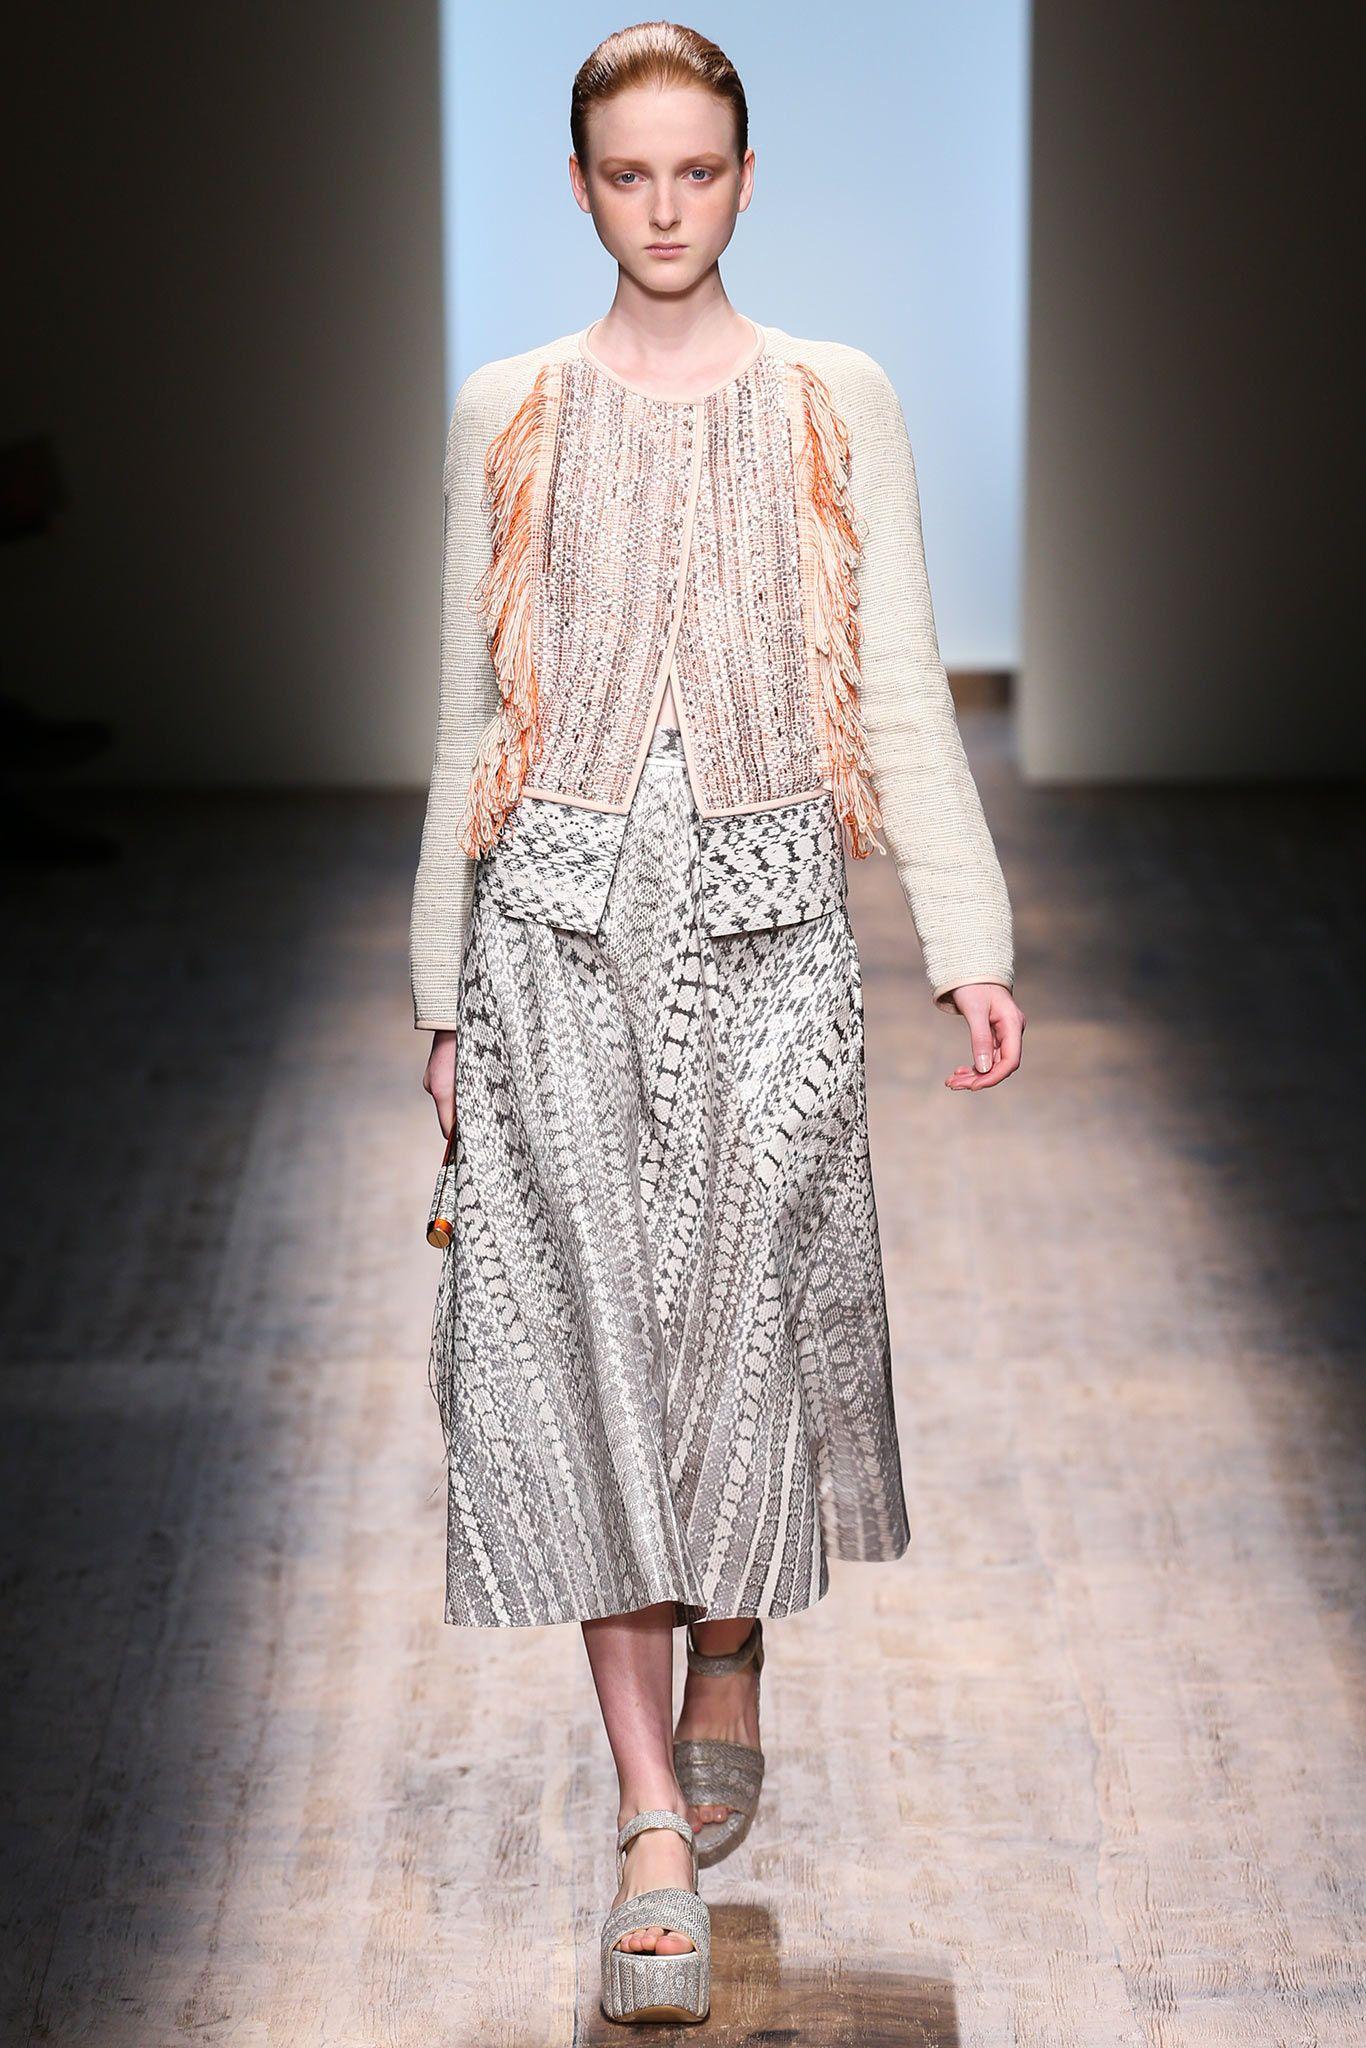 Spring 2015 Ready-to-Wear - Salvatore Ferragamo #SalvatoreFerragamo #mfw #fashionweek #model #runway #fashion